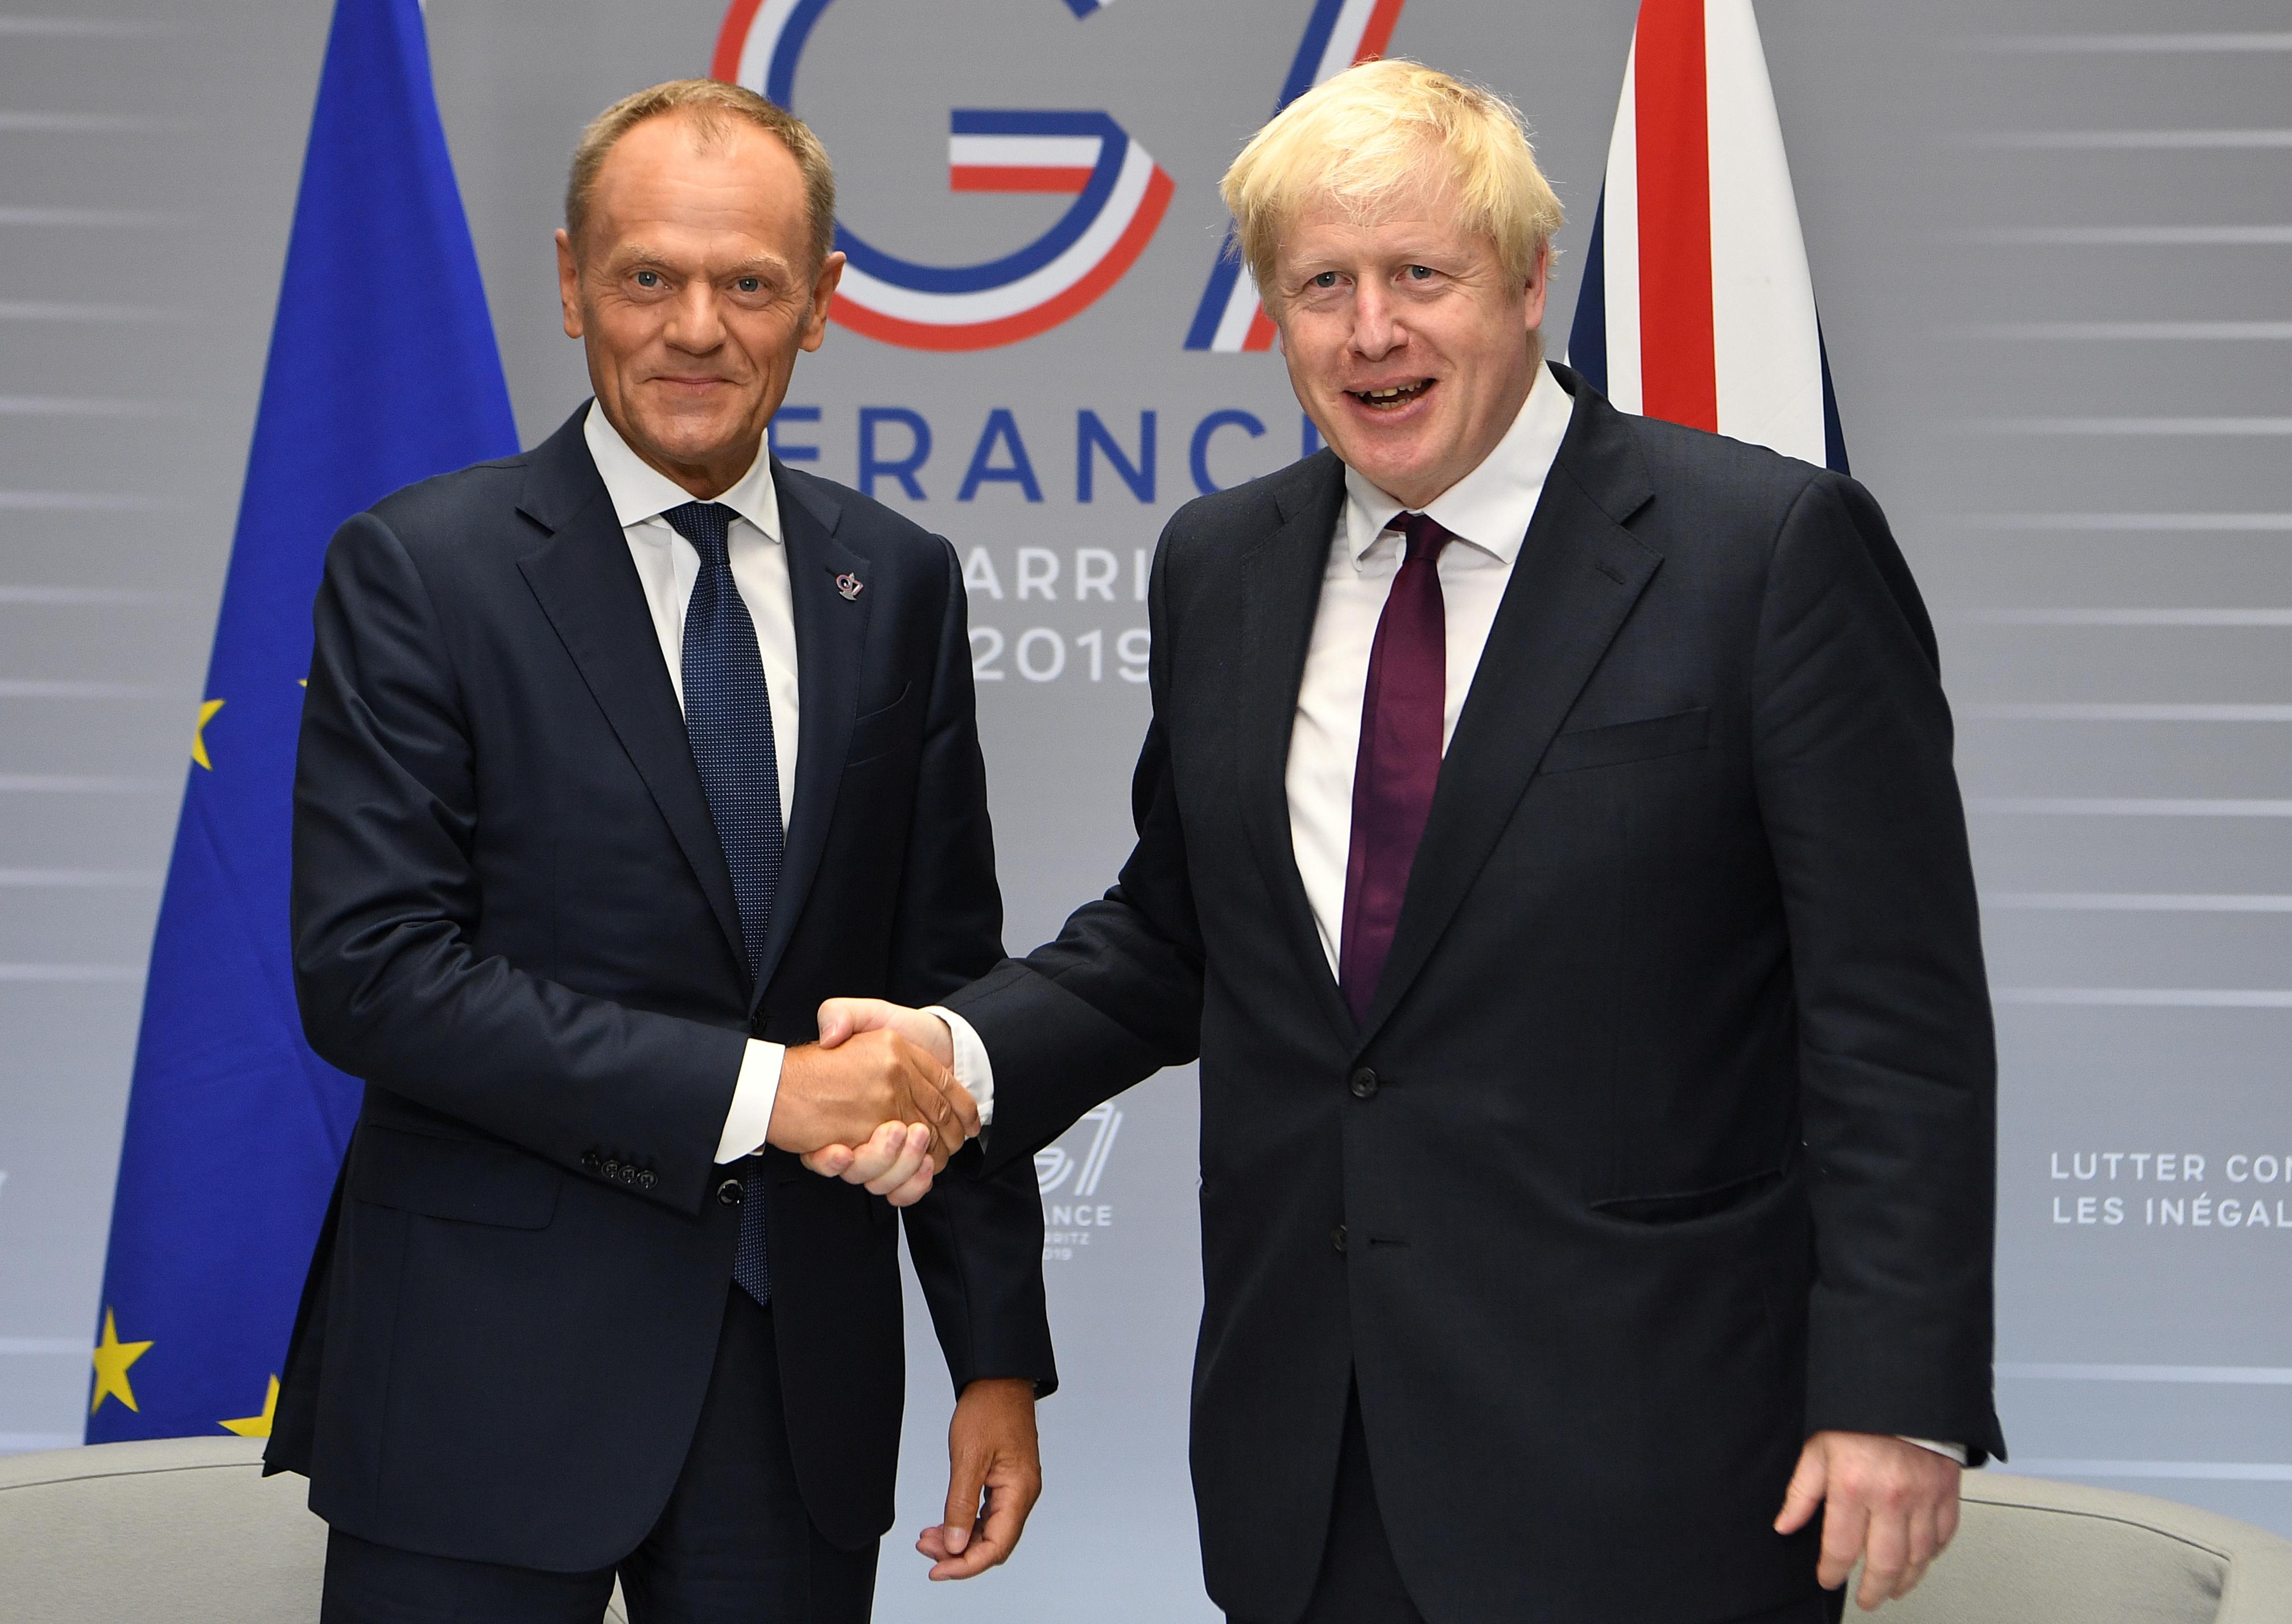 EU's Tusk, Britain's Johnson to discuss Brexit next week